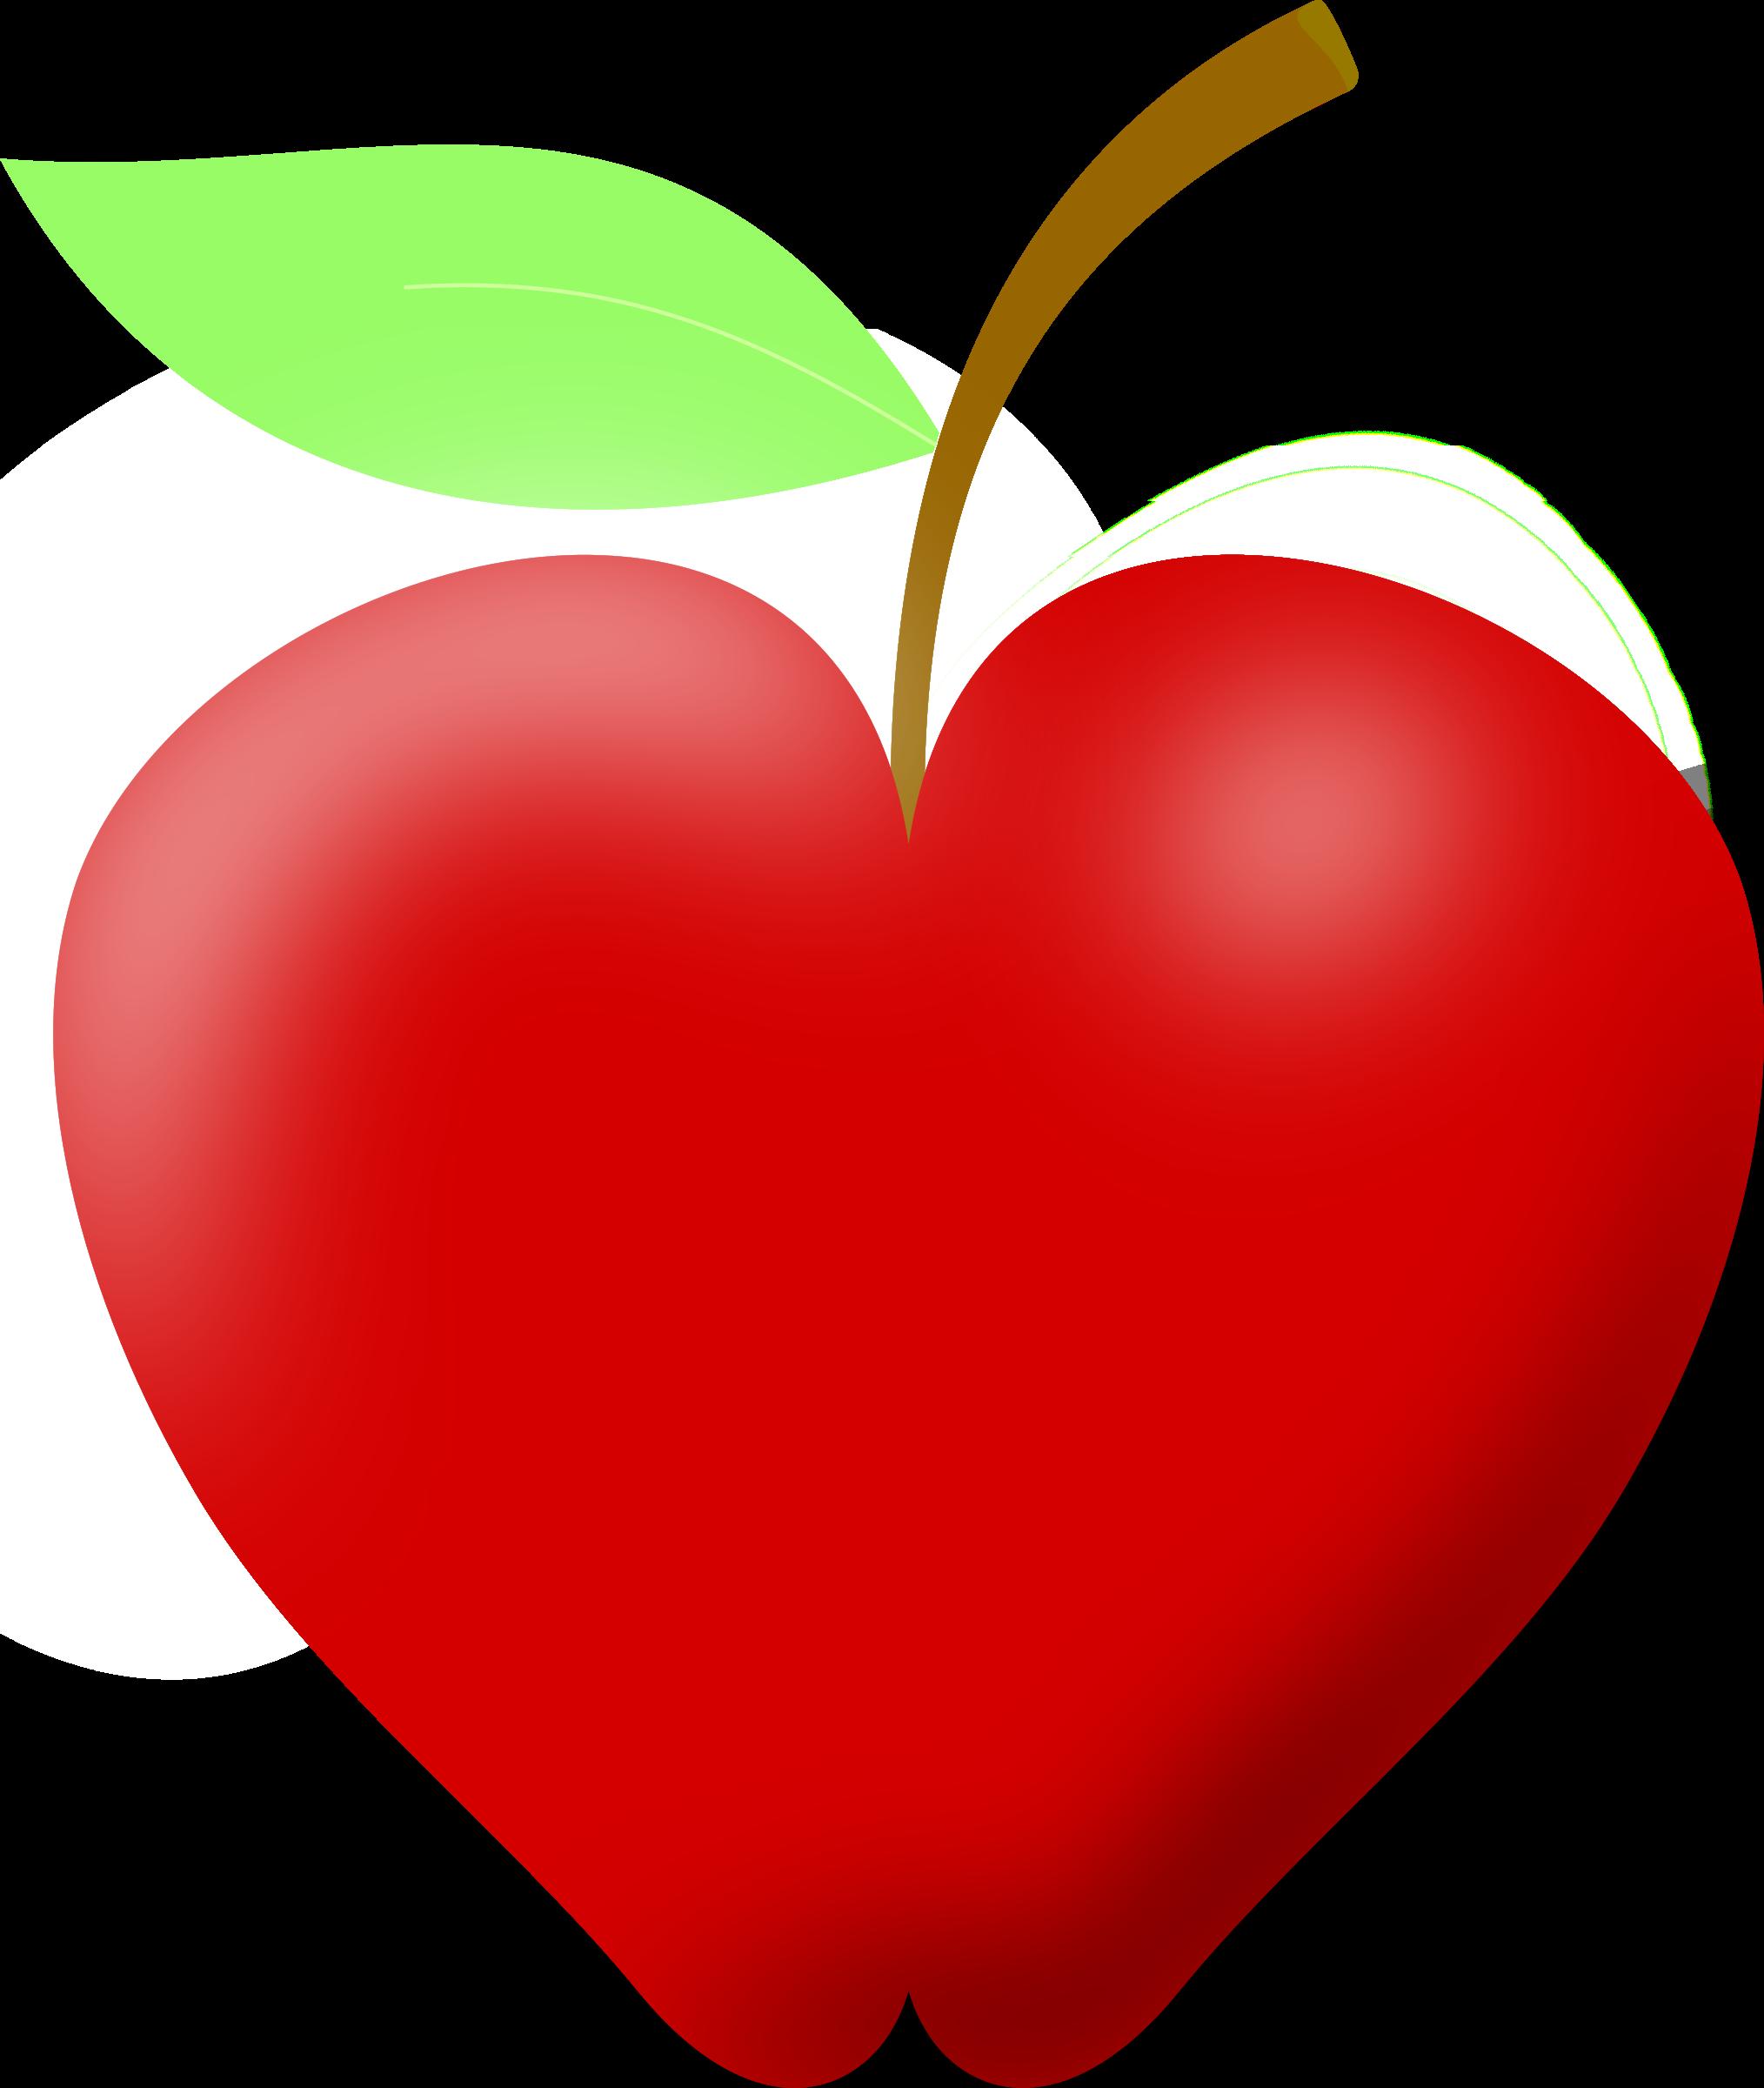 Heart shaped caramel apple clipart png jpg freeuse stock Apple clipart heart jpg freeuse stock